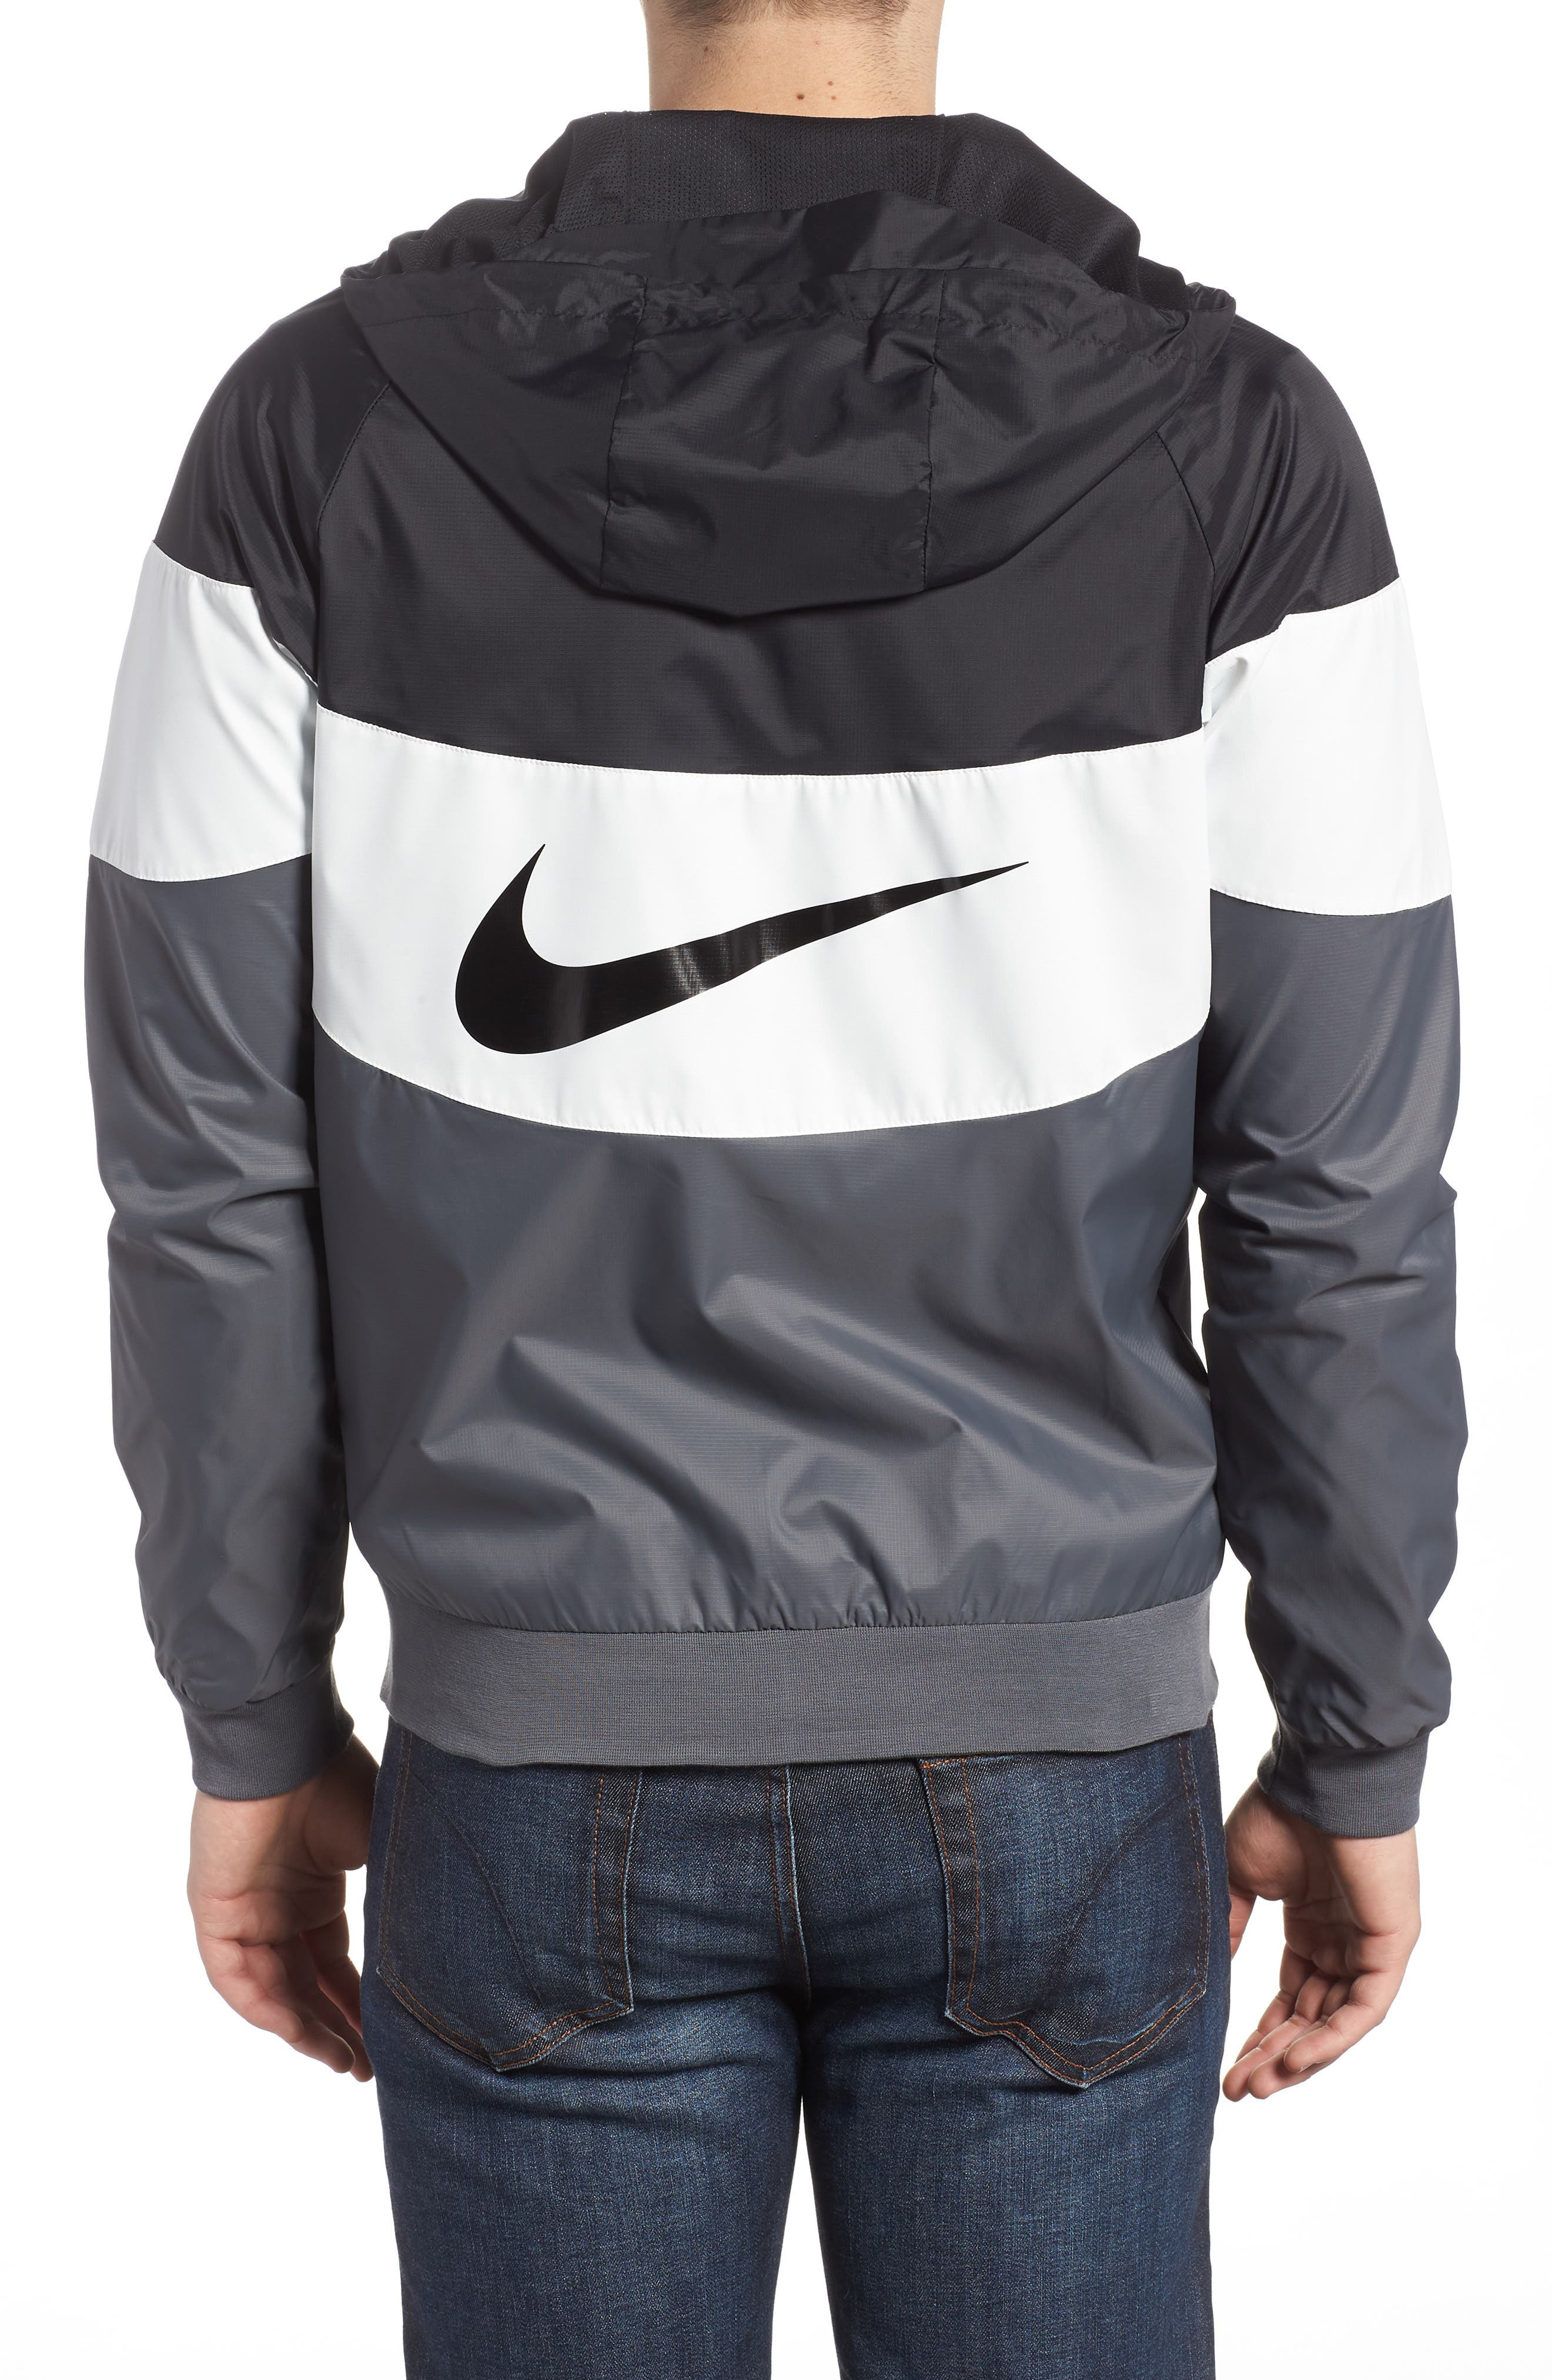 Windrunner Wind & Water Repellent Hooded Jacket,                             Alternate thumbnail 2, color,                             Black/ Summit White/ Dark Grey